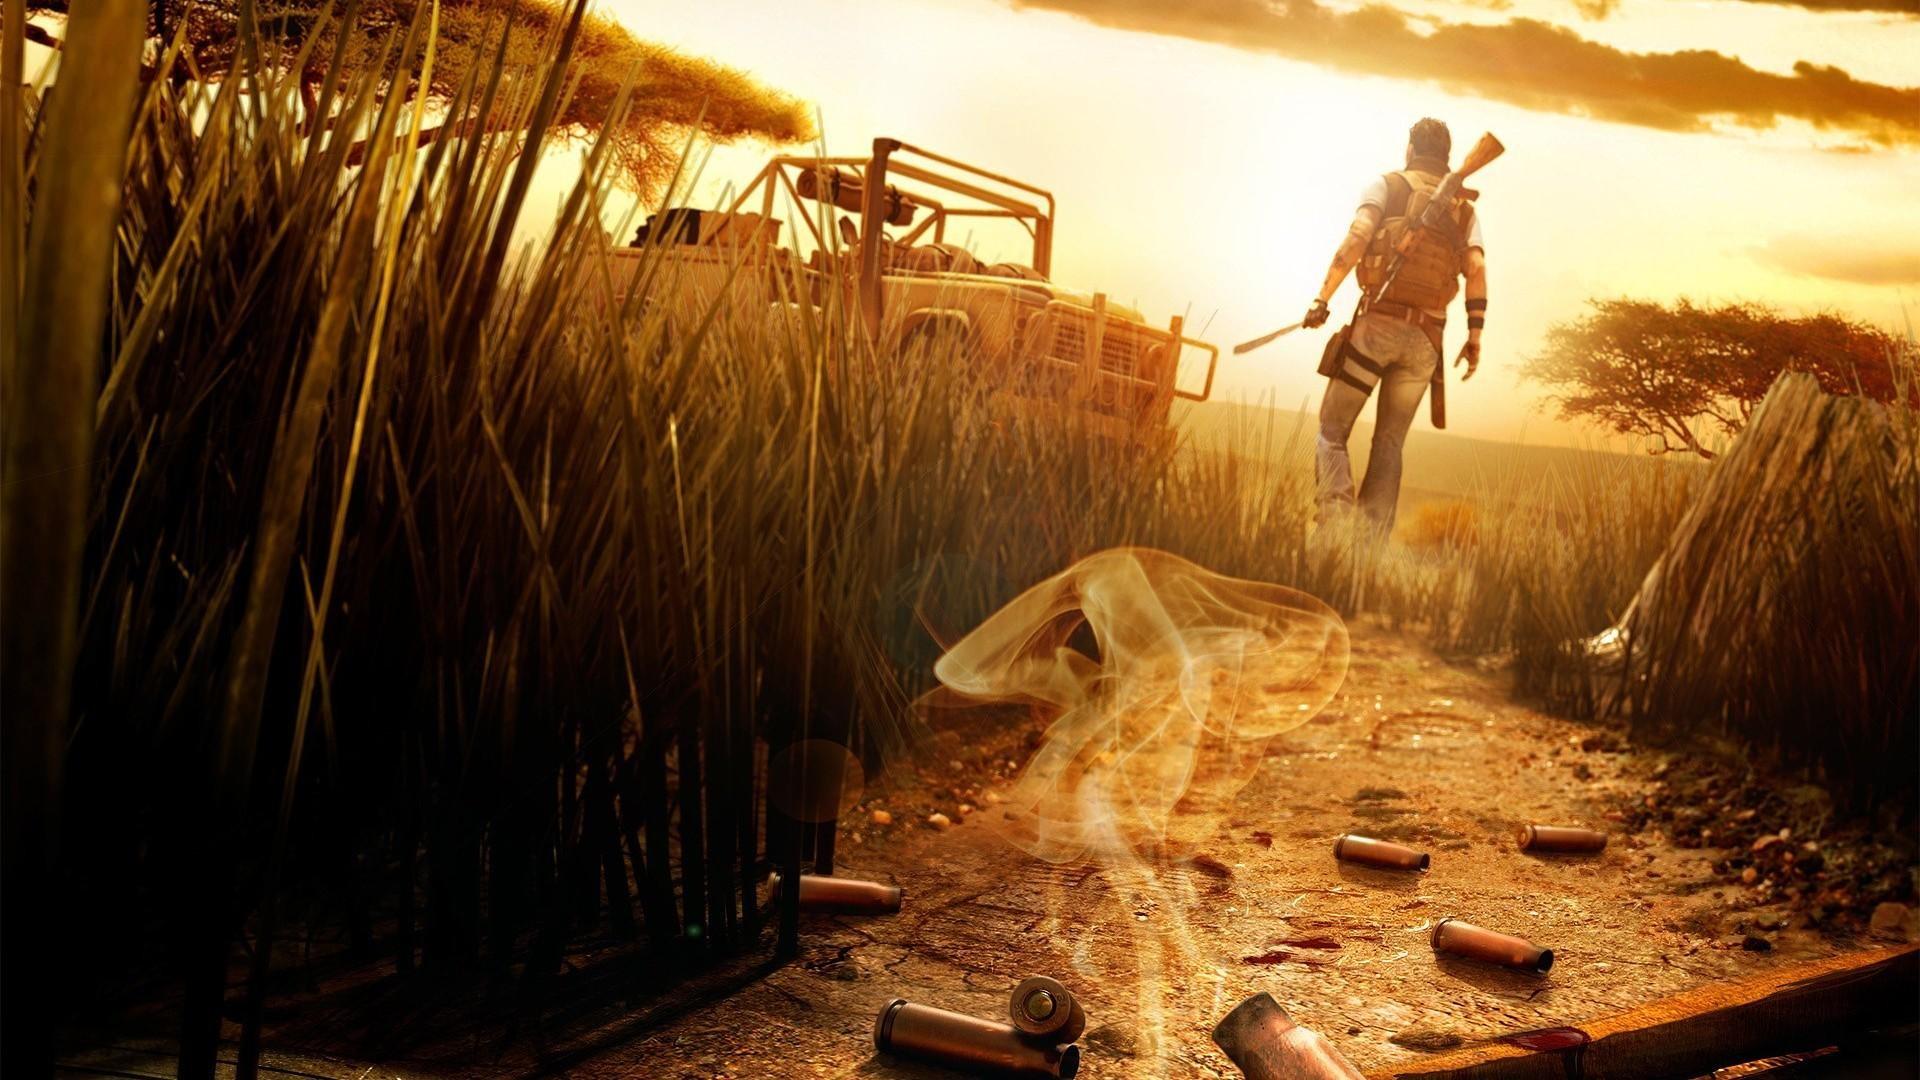 Far Cry 3 Wallpaper …